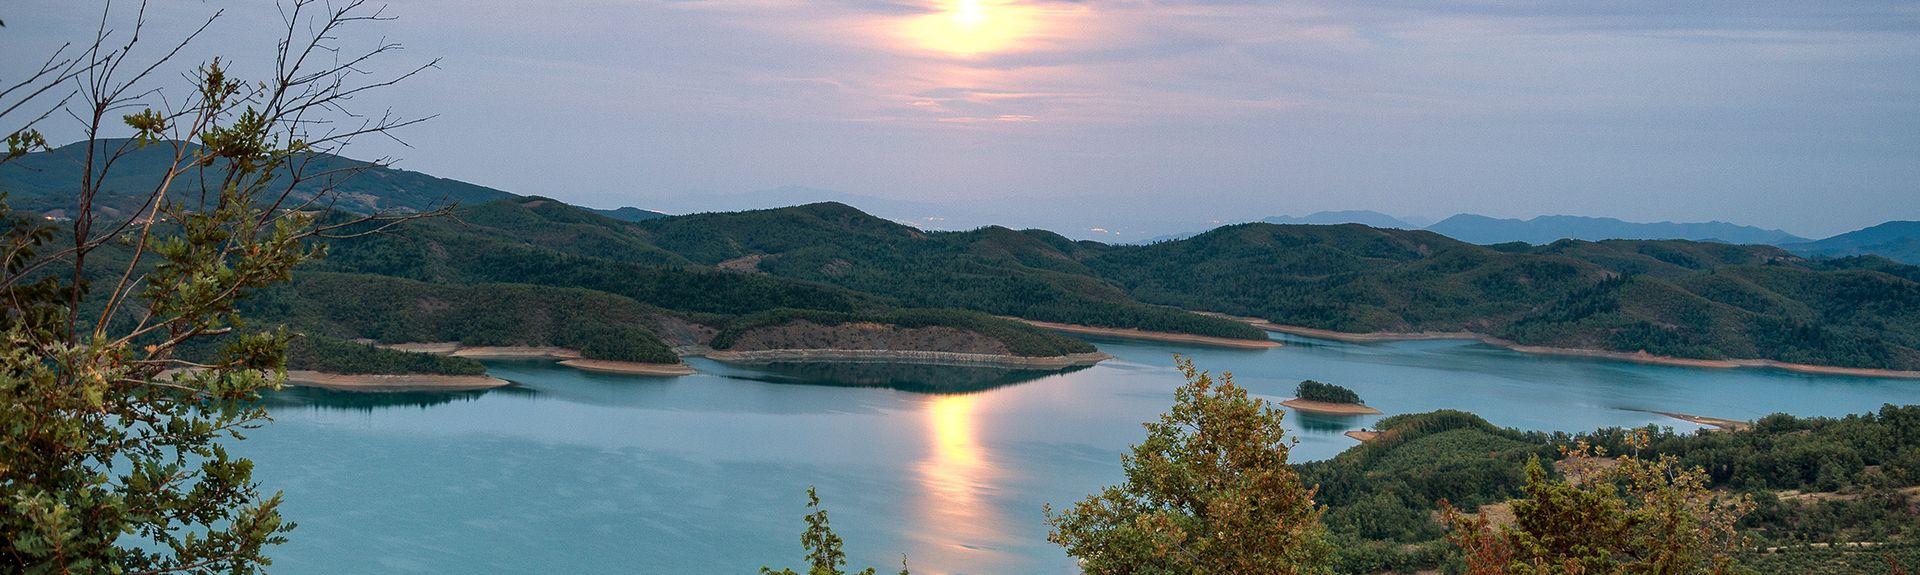 Evrytania, Greece